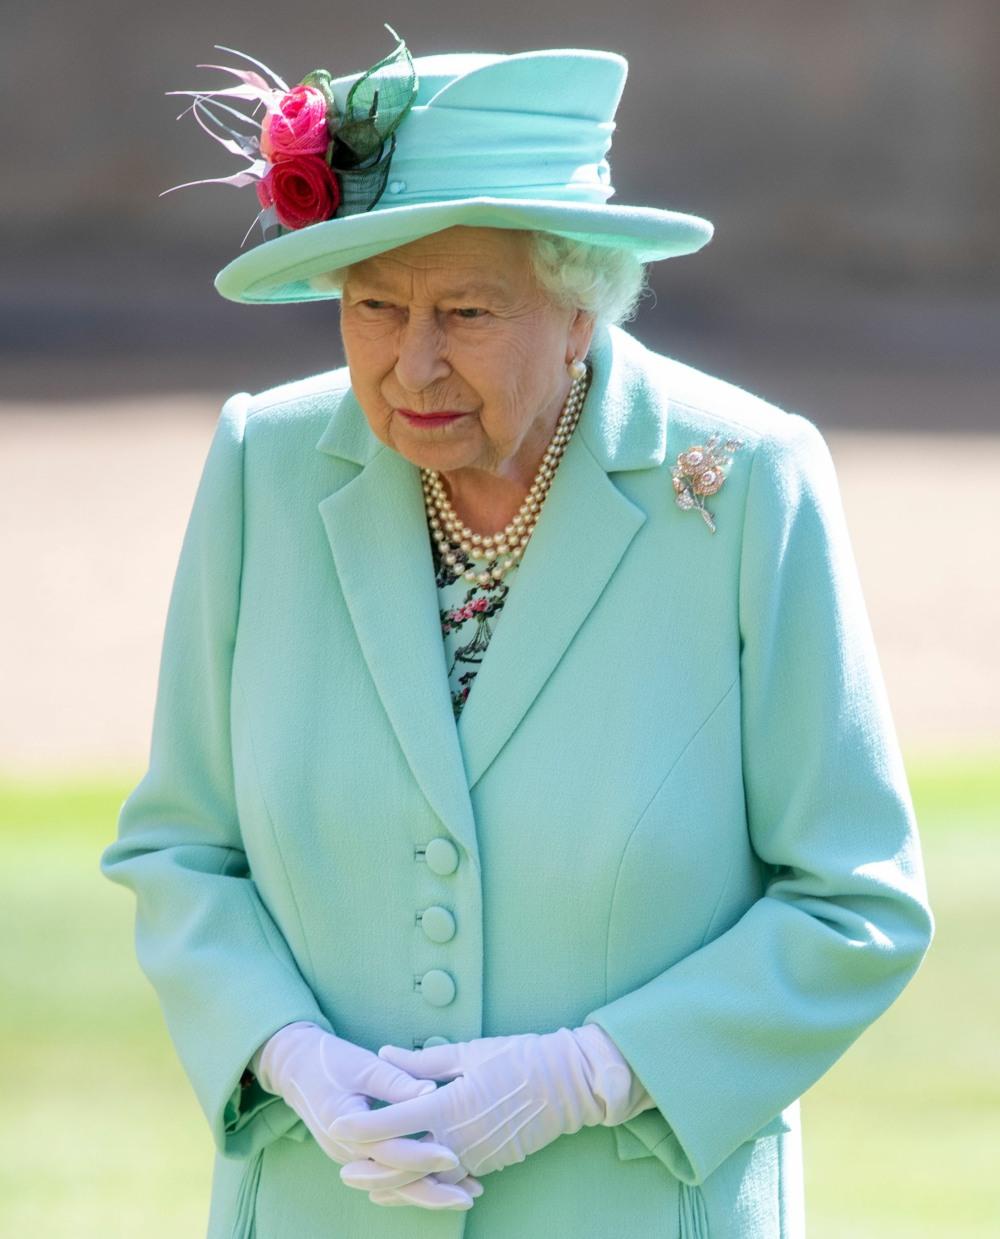 Captain Tom Moore knighthood ceremony, Windsor Castle, UK - 17 Jul 2020